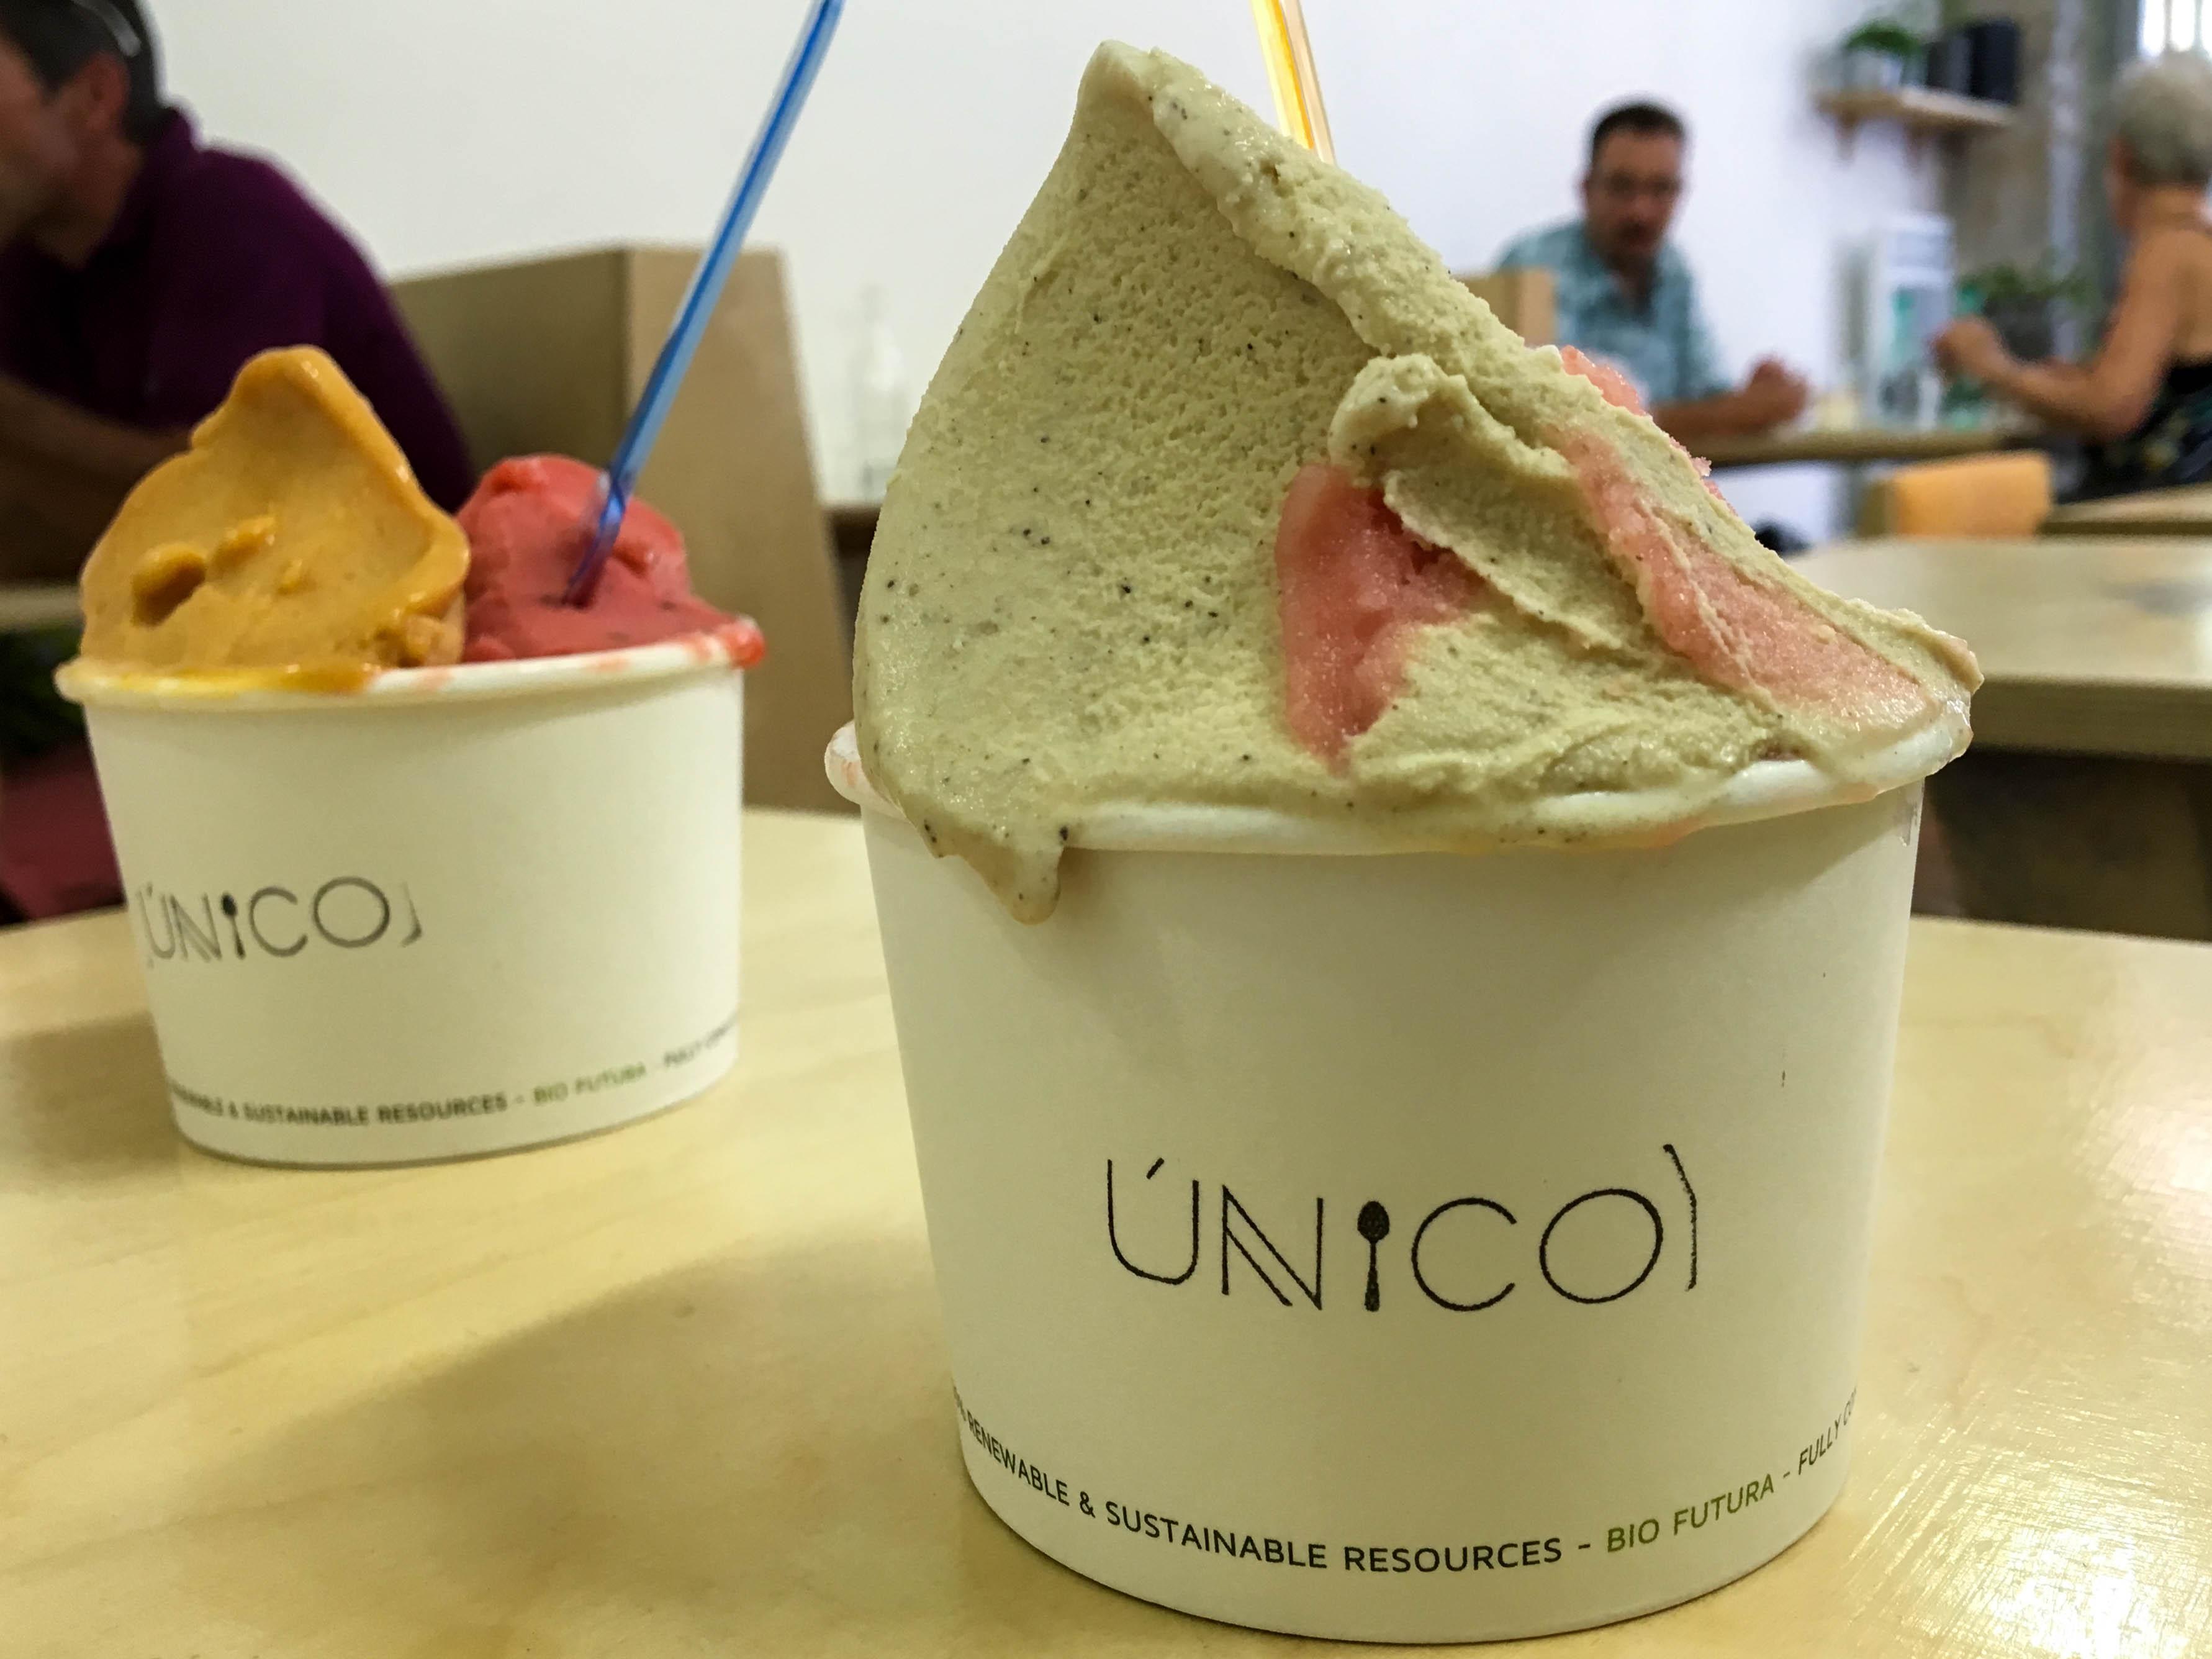 Unico - Glaces